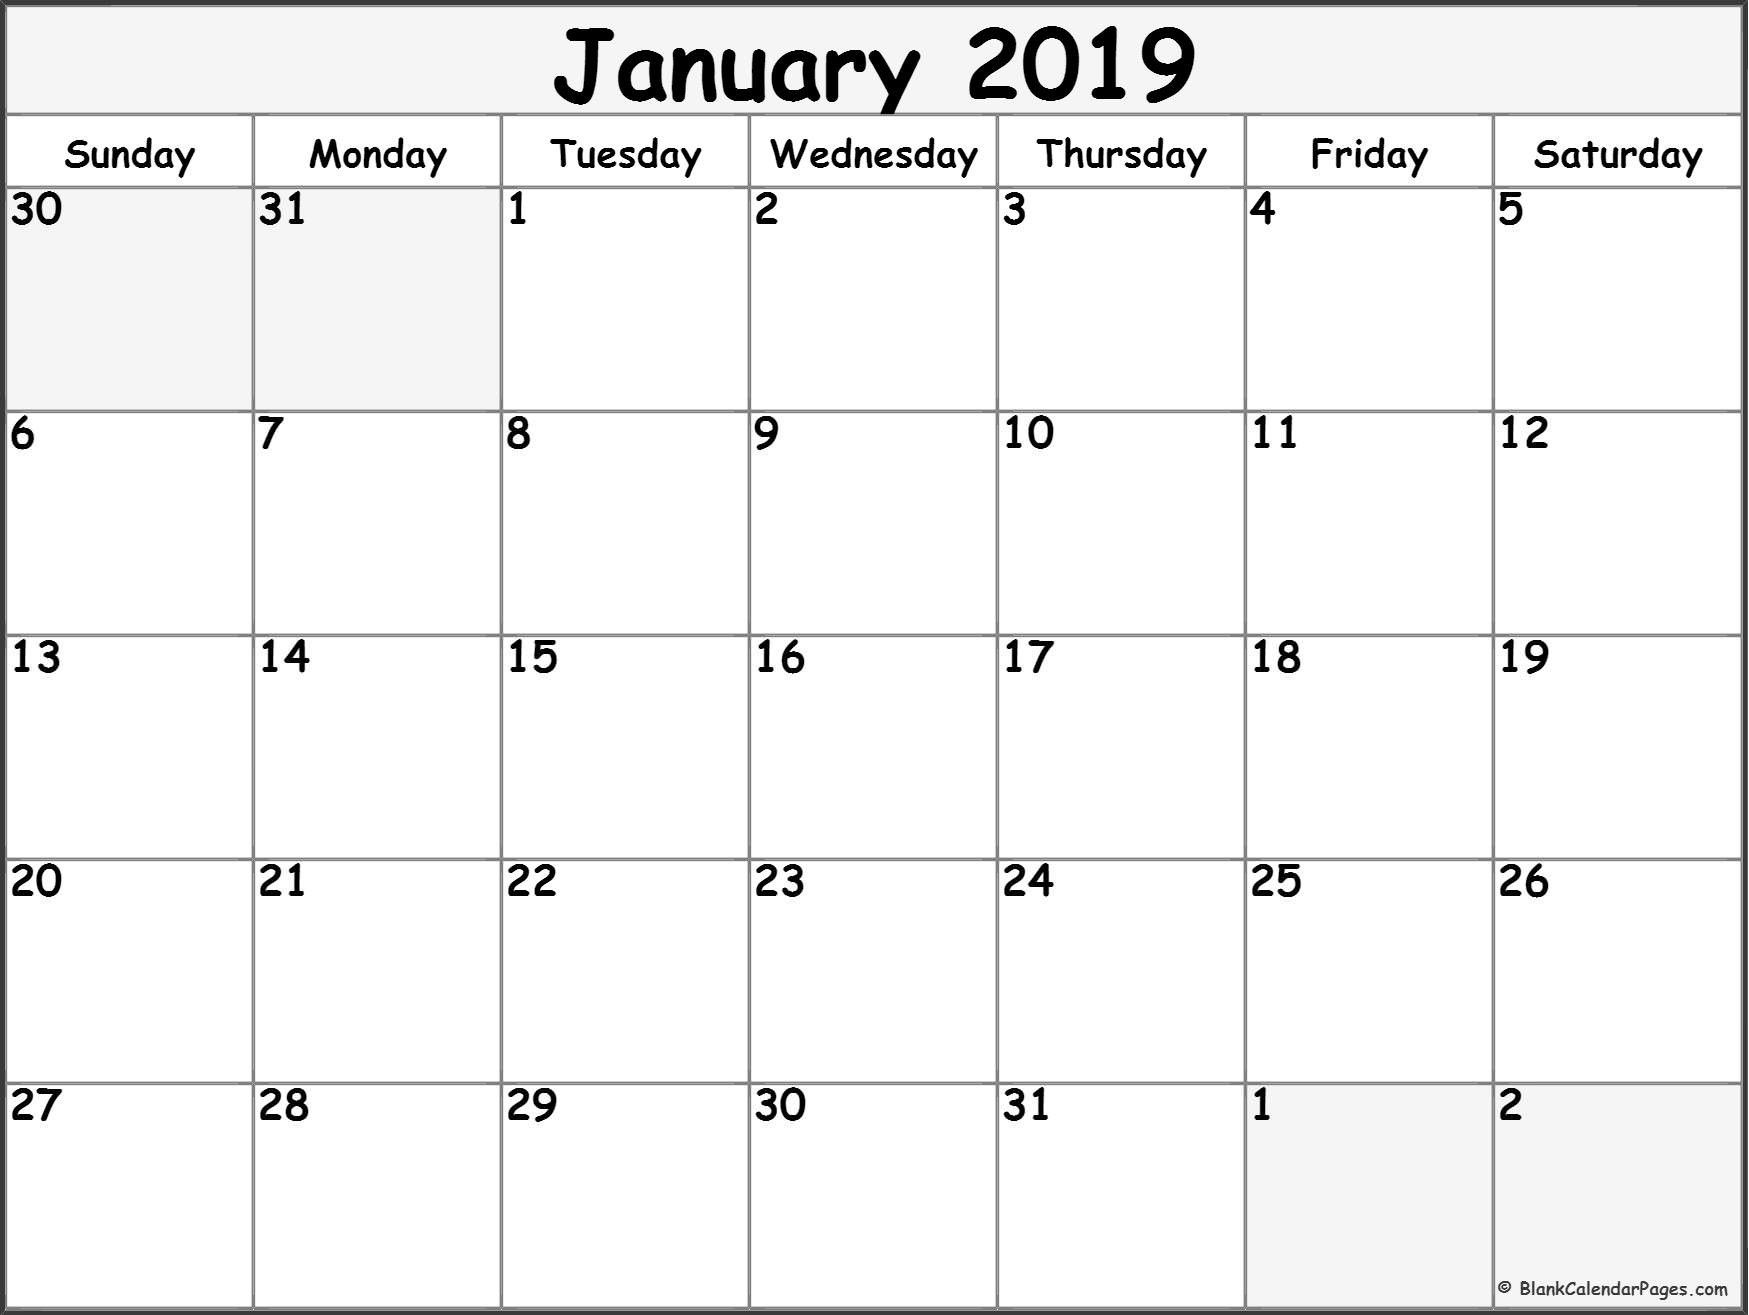 January 2019 Calendar Printable Calendar Calendar2019